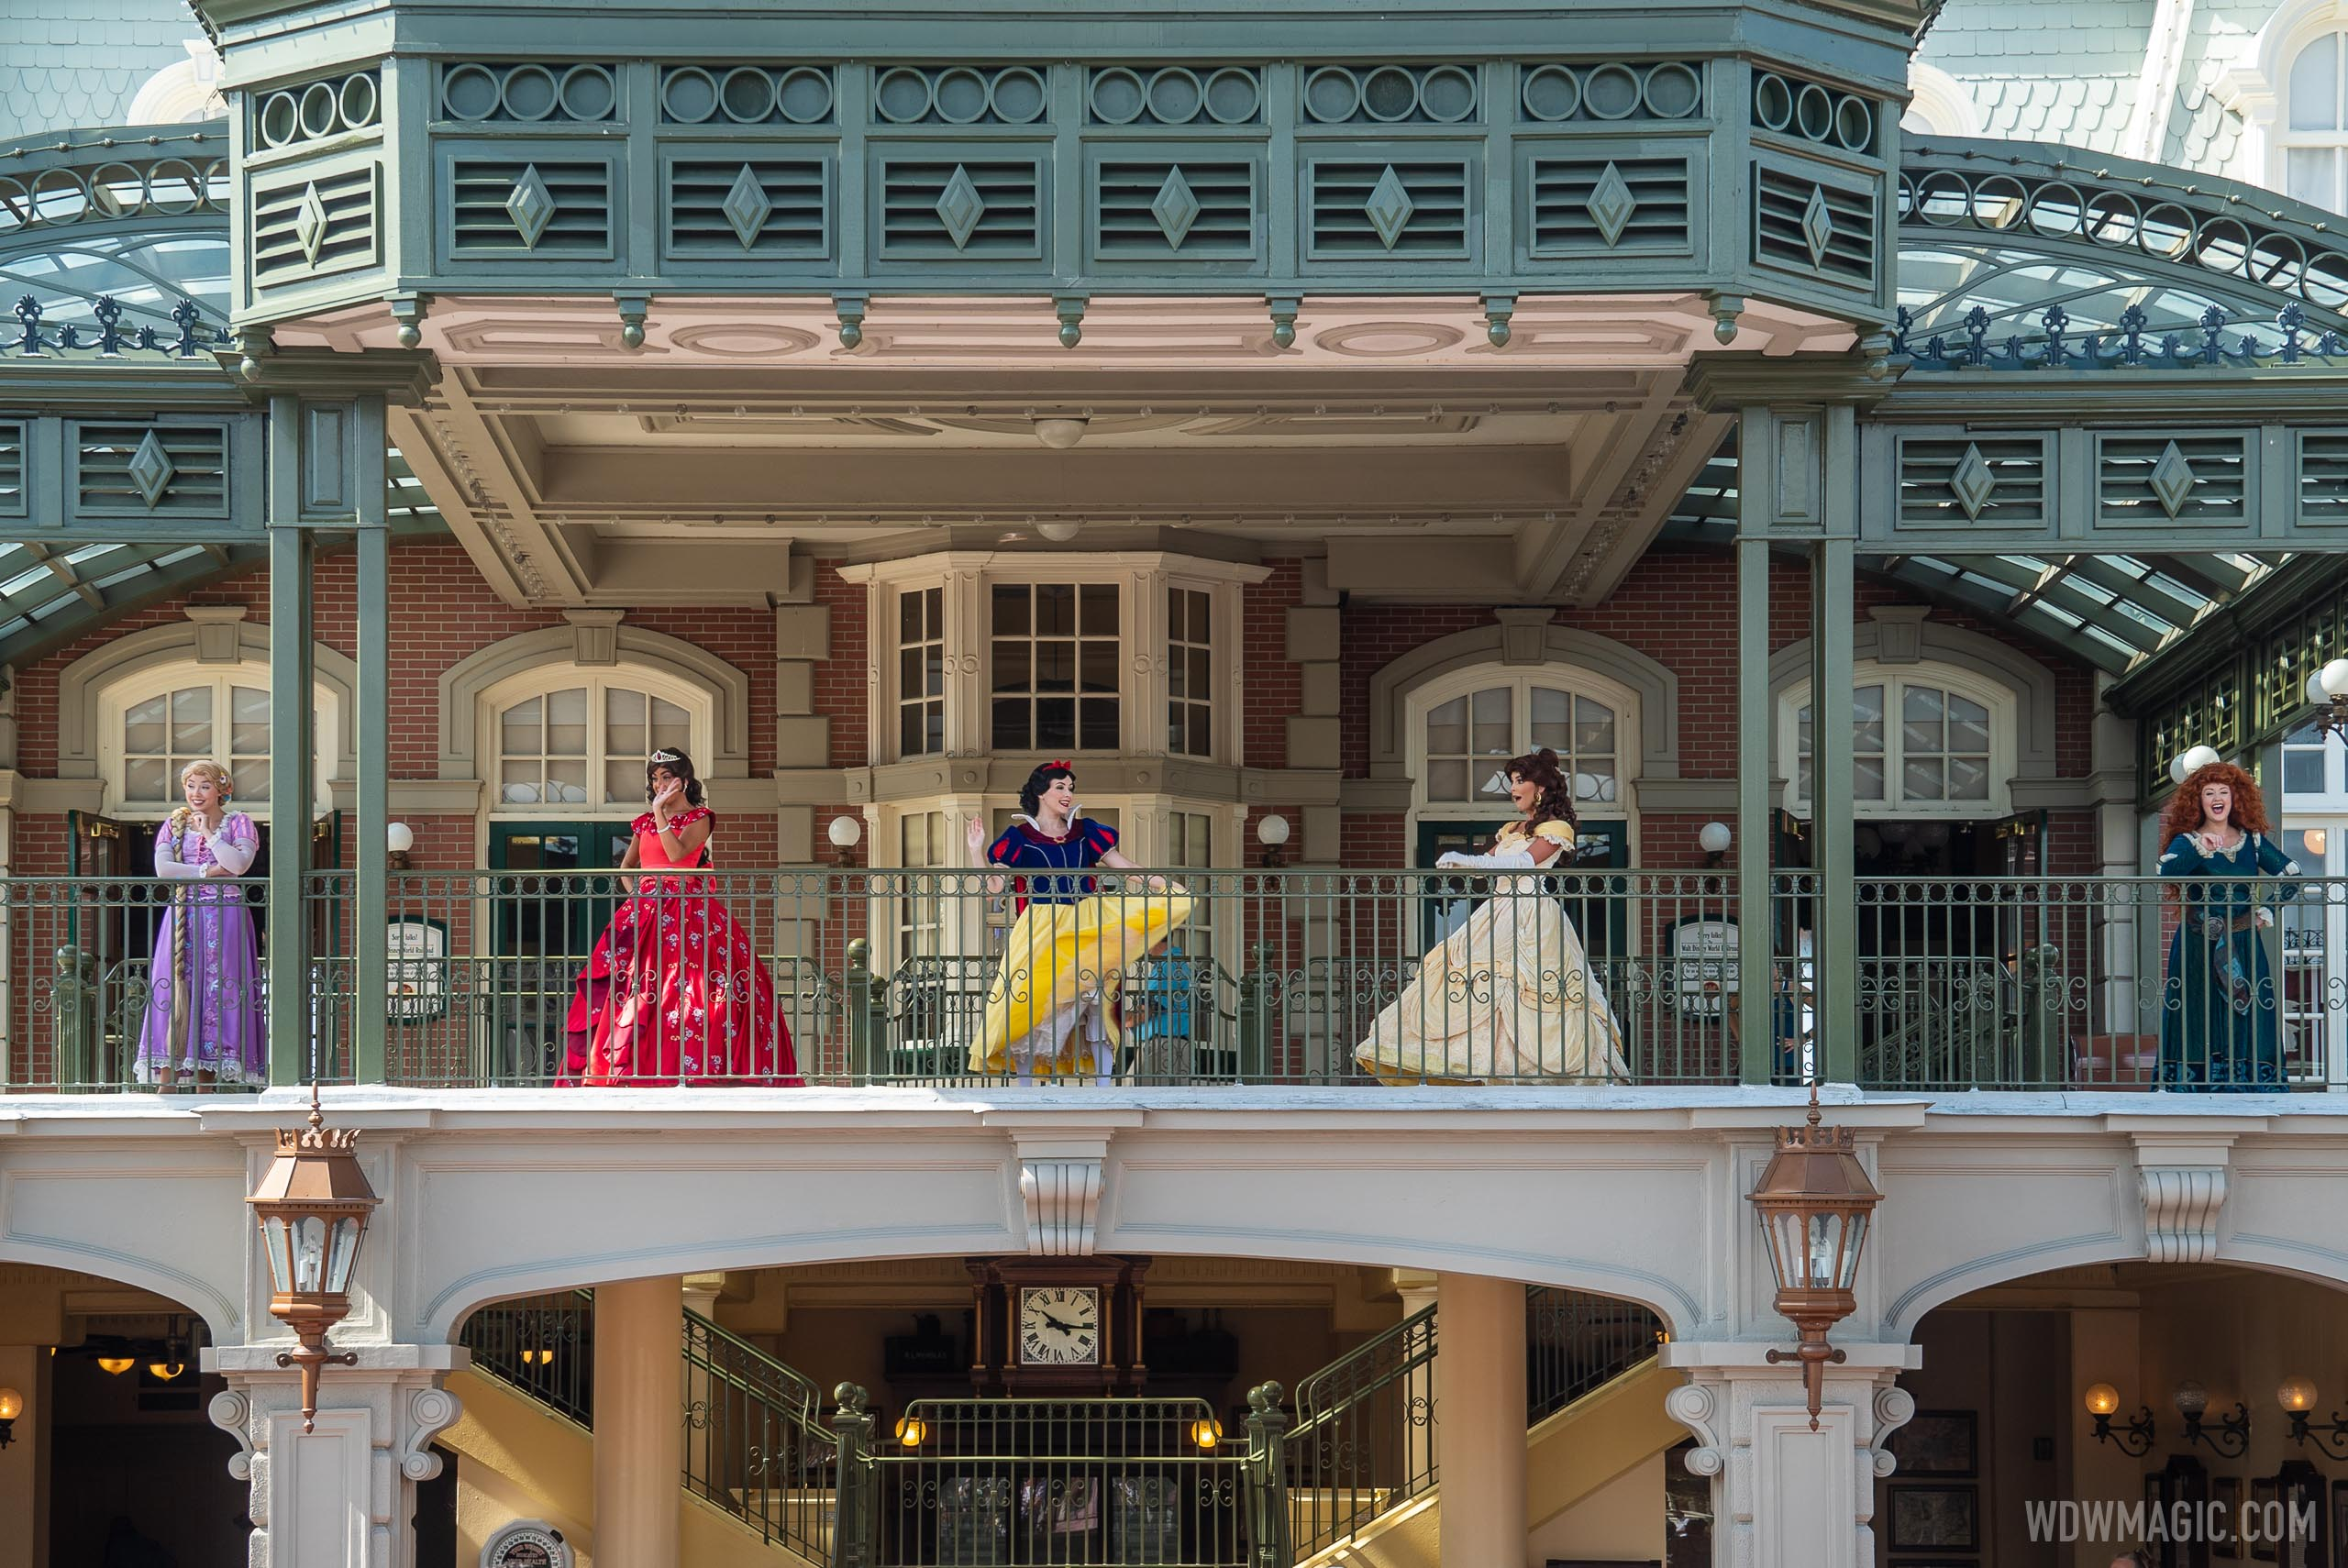 Disney Princesses on the train station balcony